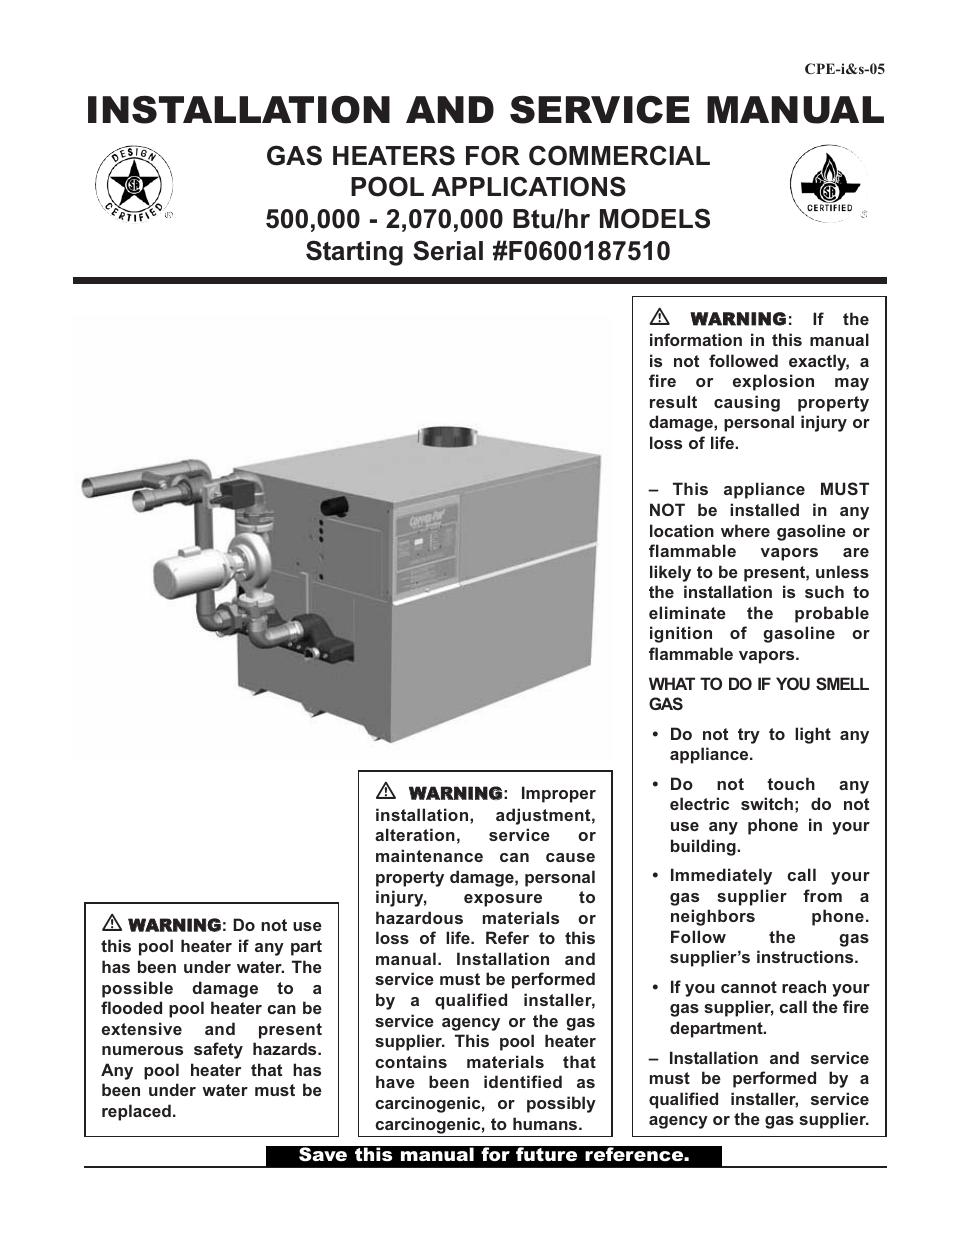 Famous Lochinvar Heat Exchanger Failure Component - Wiring Standart ...